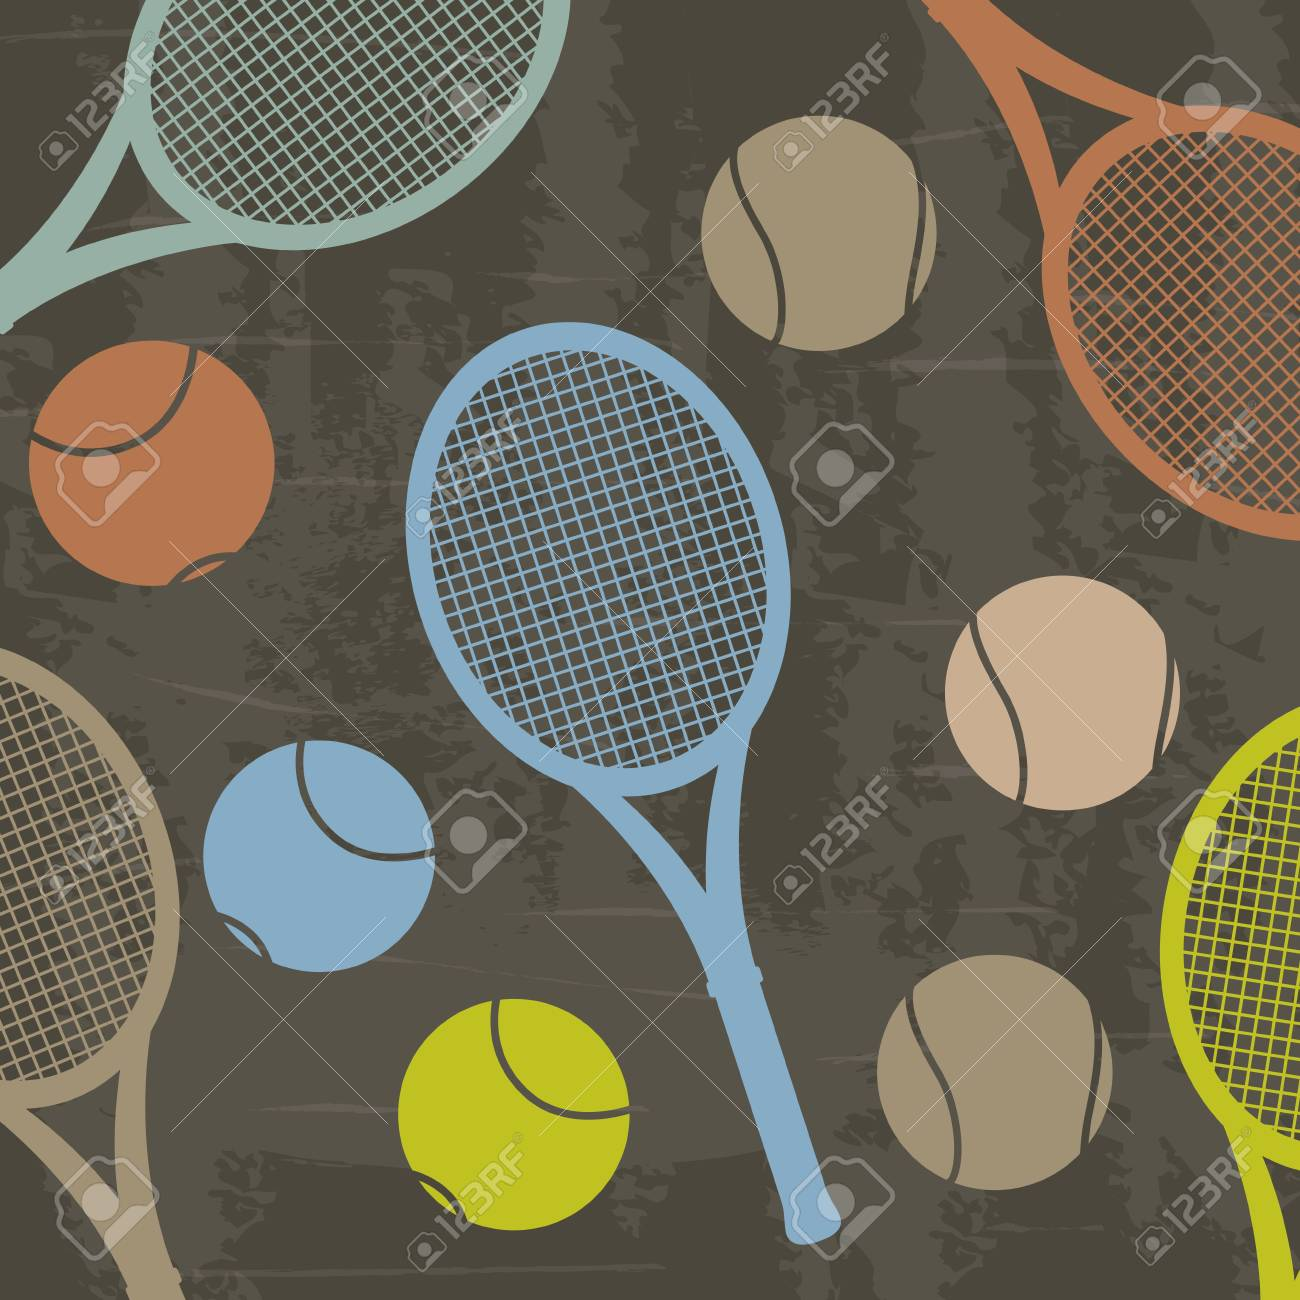 tennis design over grunge background vector illustration Stock Vector - 19916671